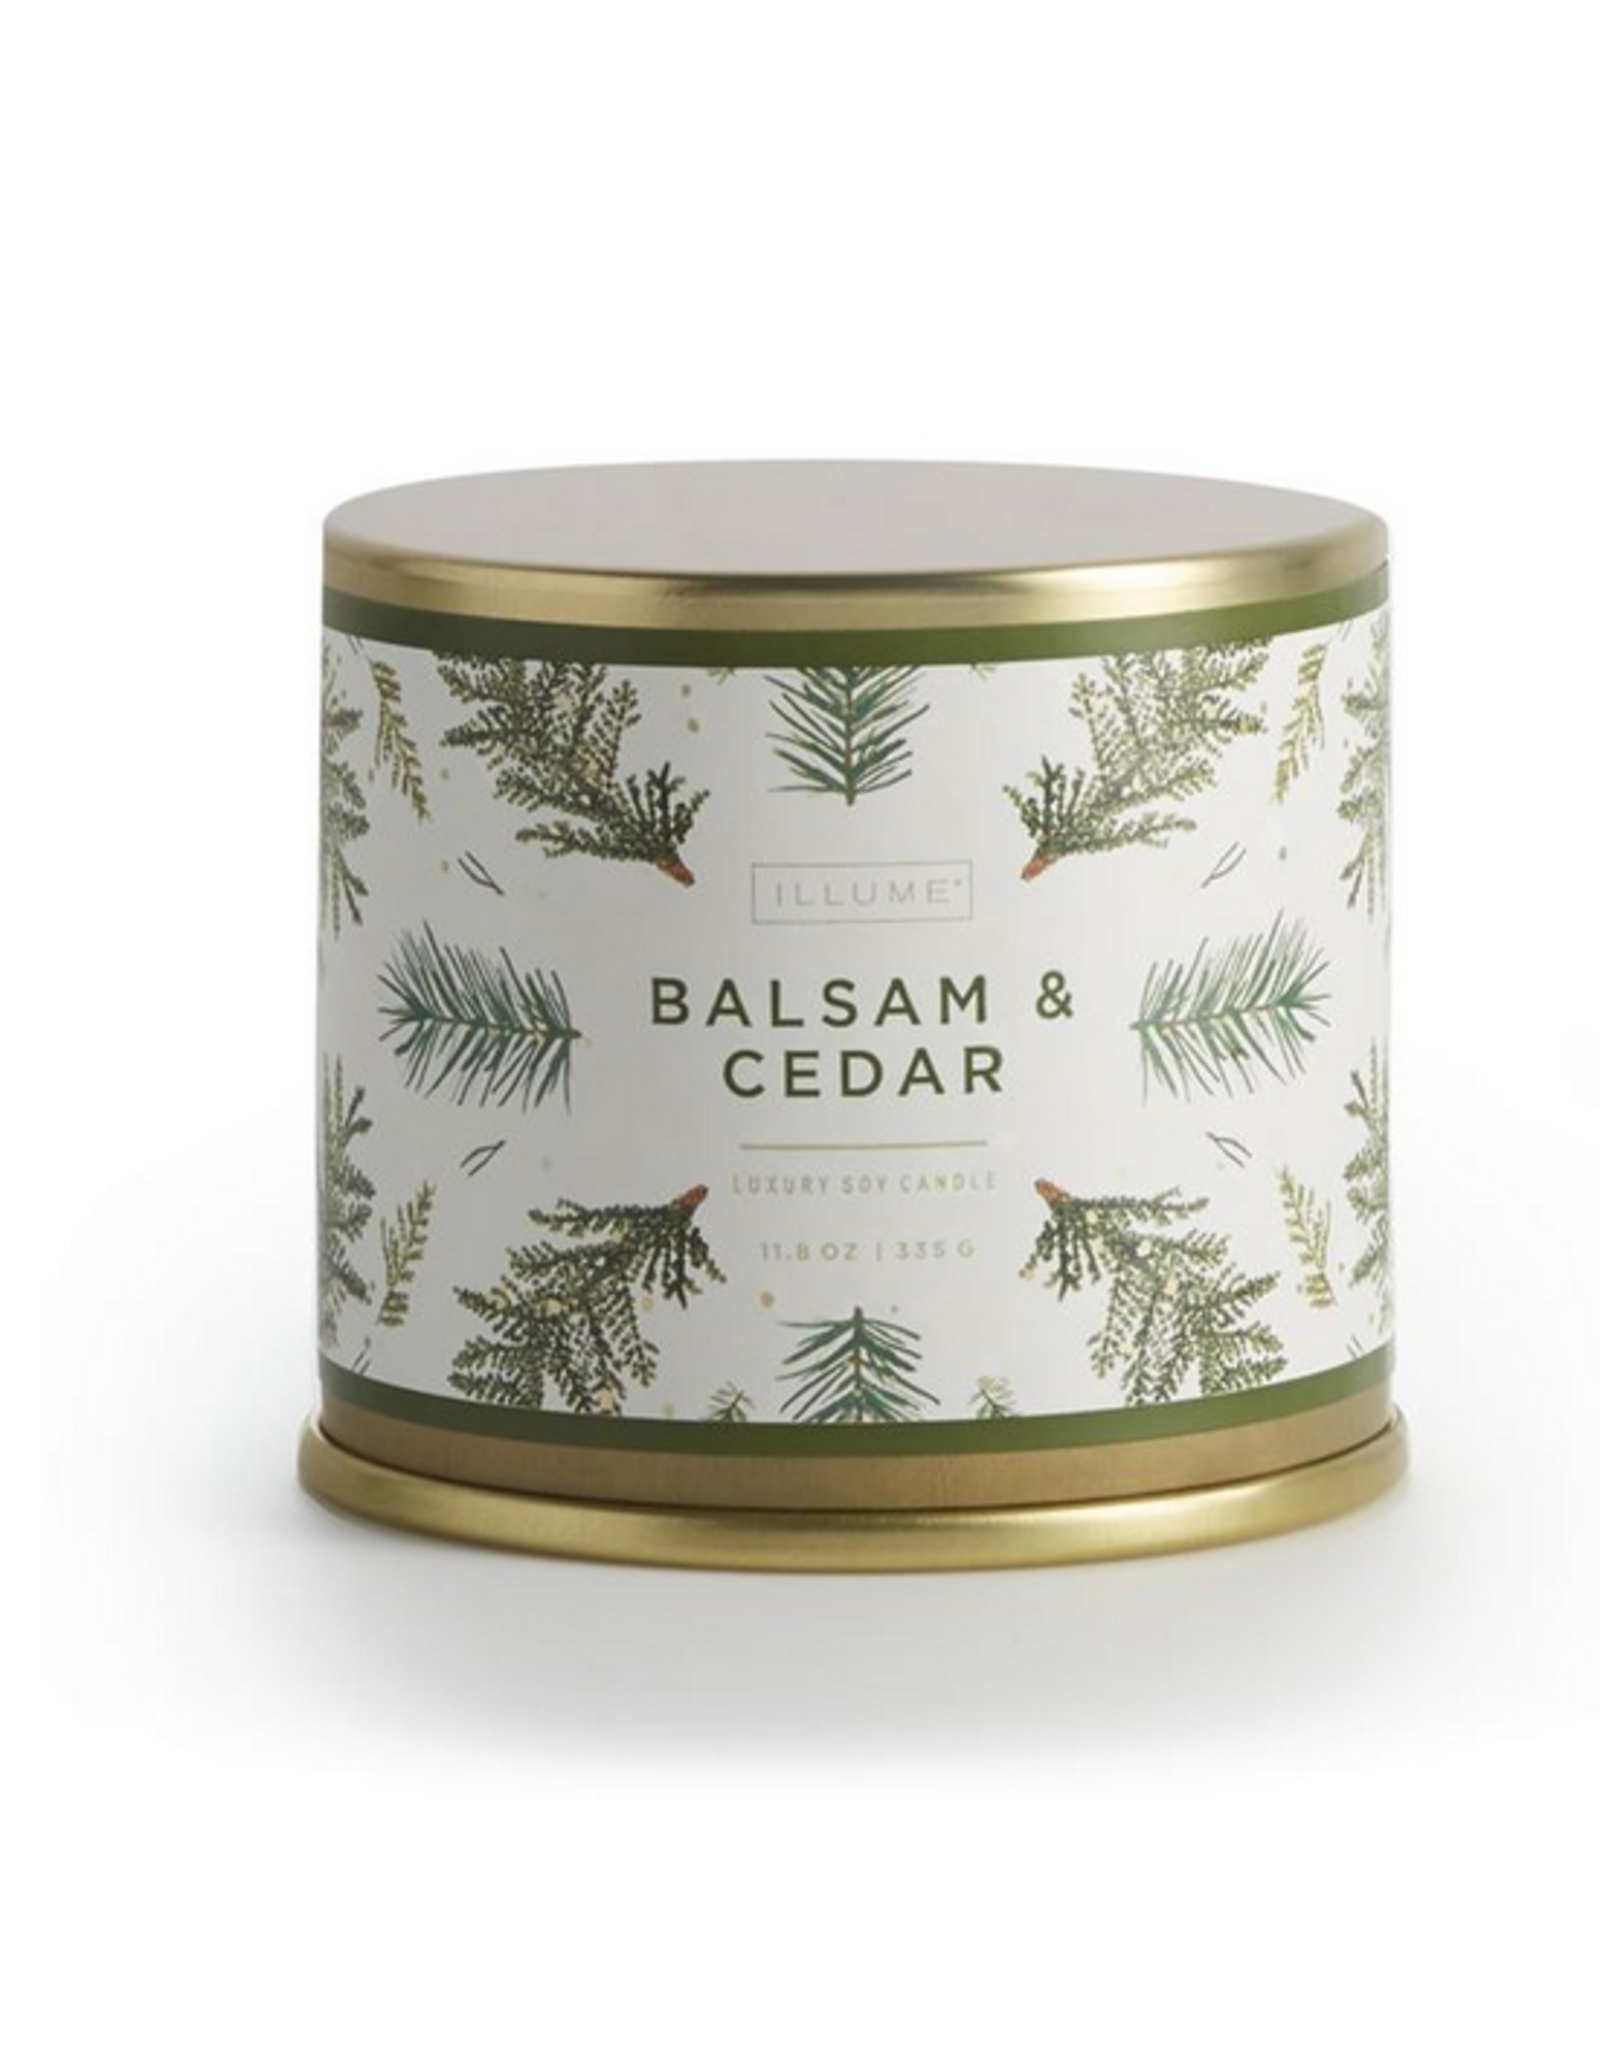 Balsam & Cedar Large Tin Candle